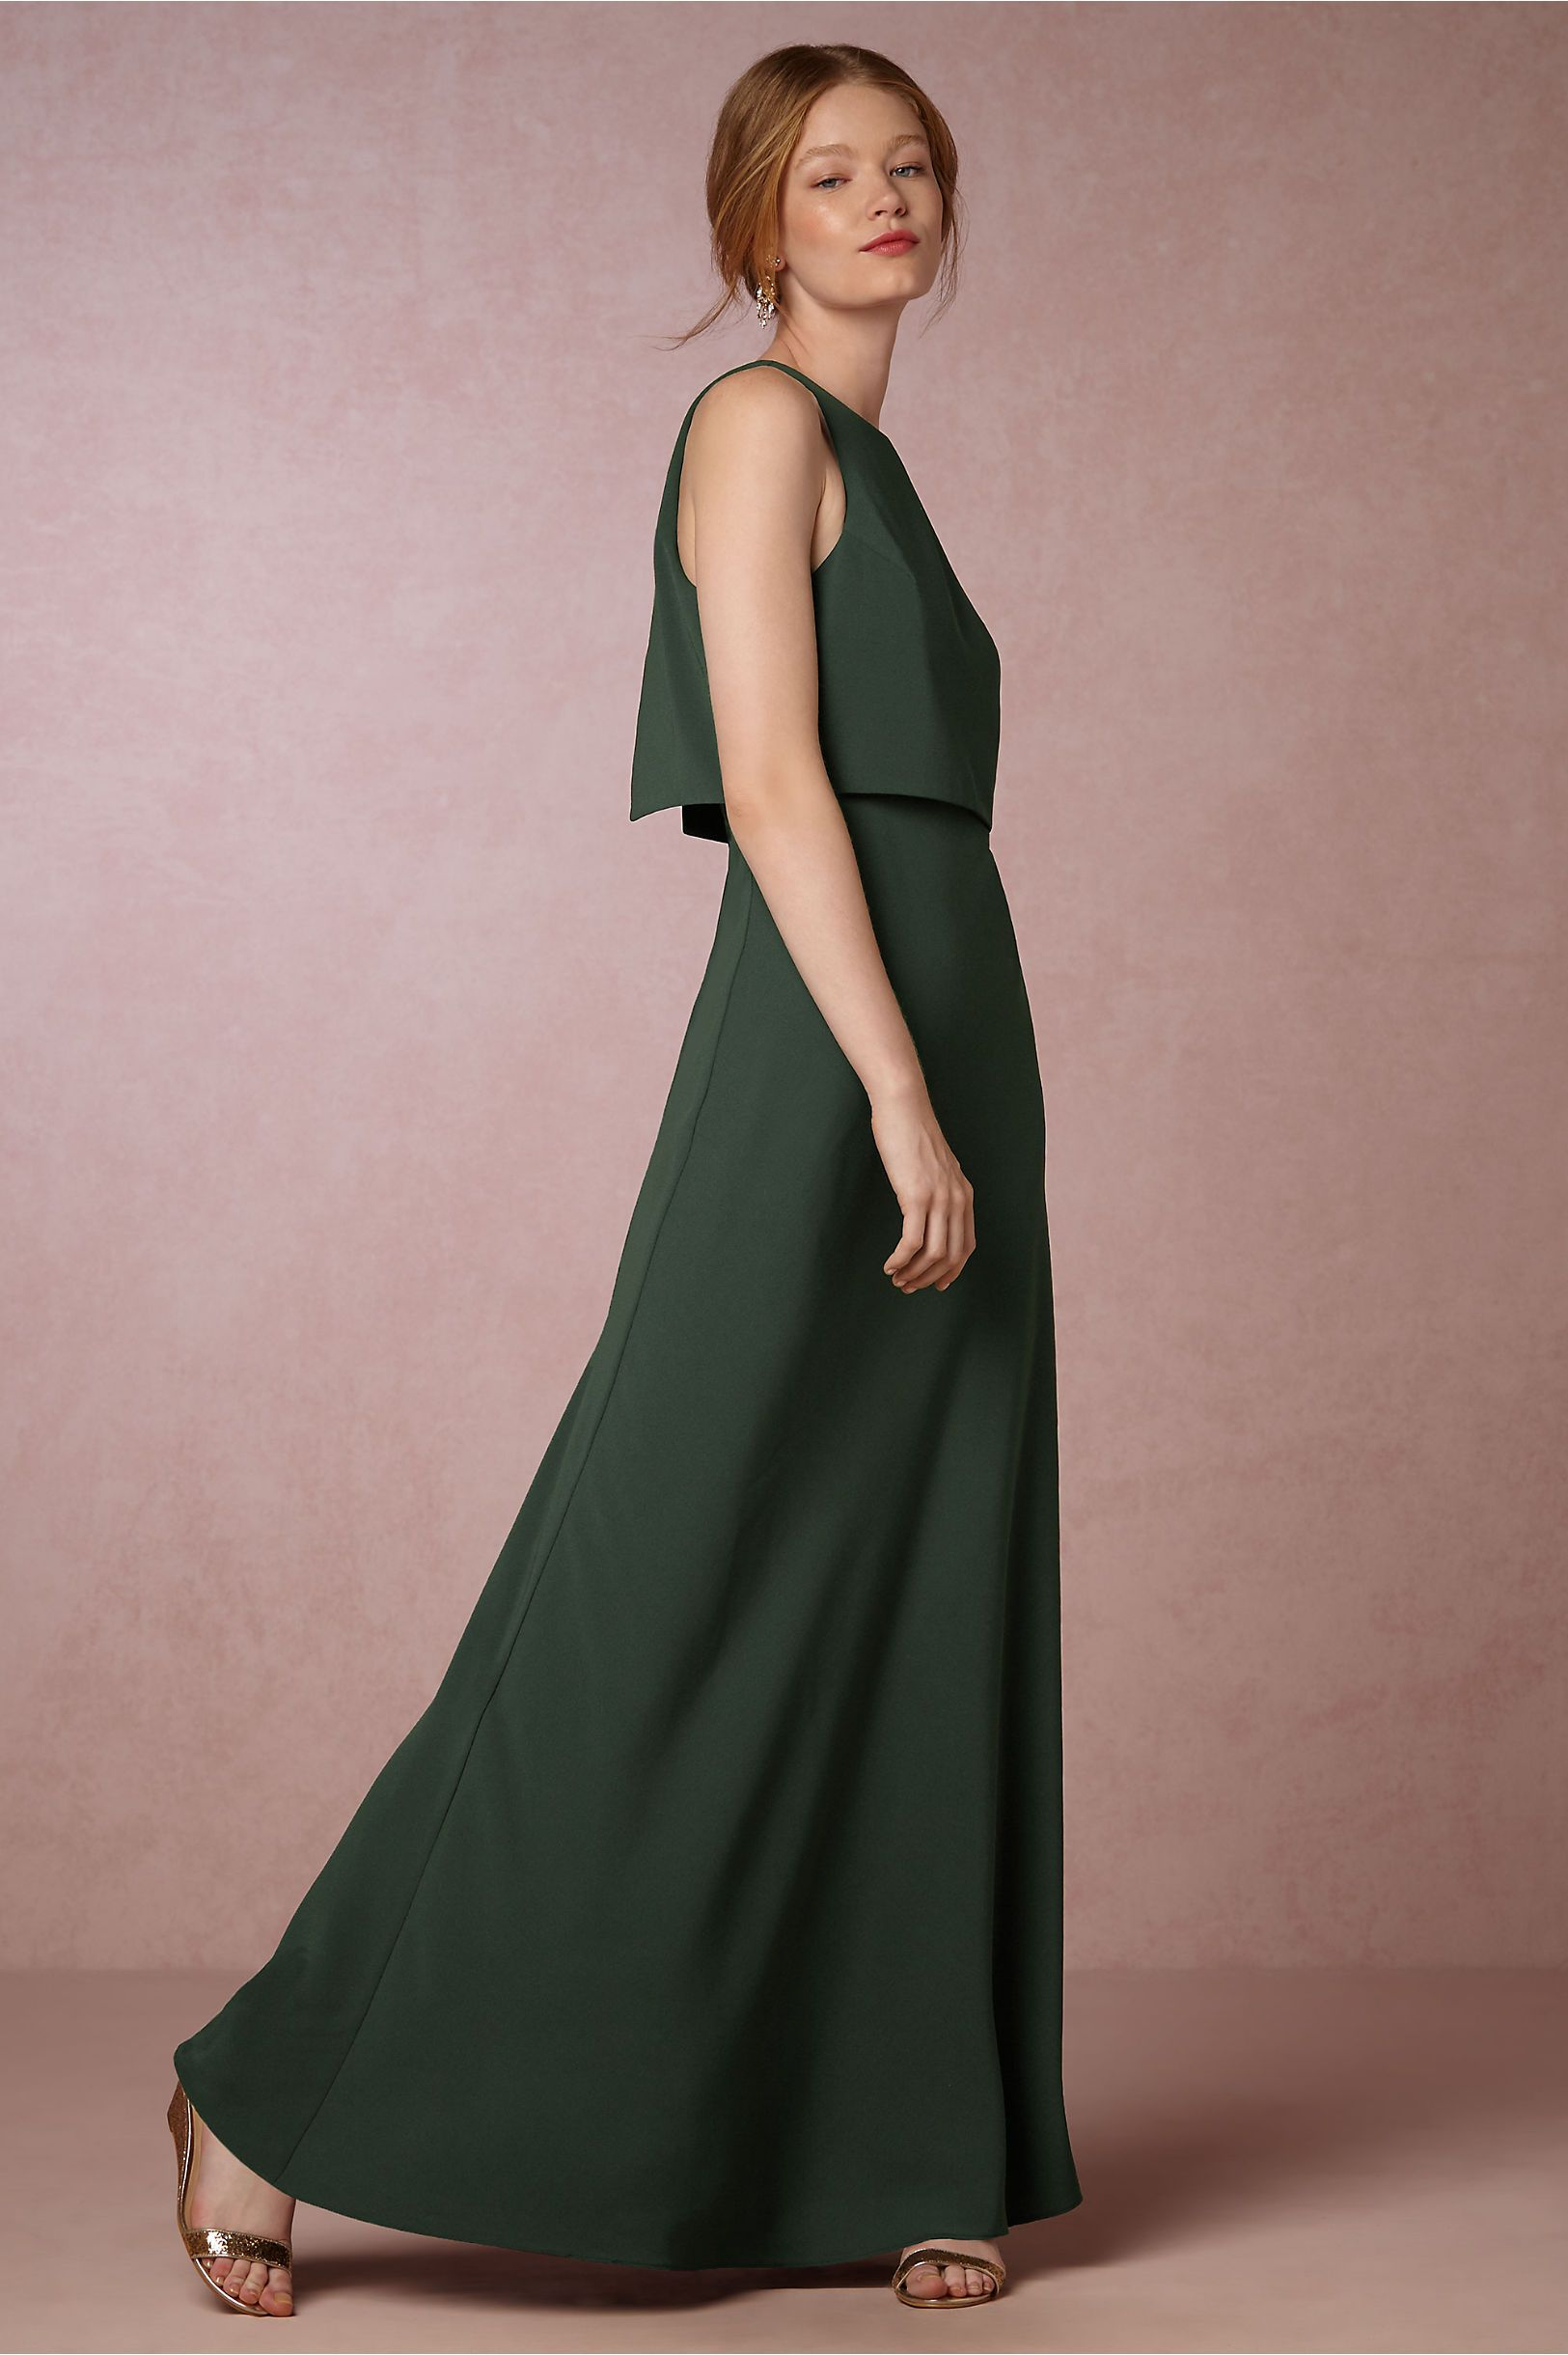 28276cf0923 emerald green long bridesmaid dress